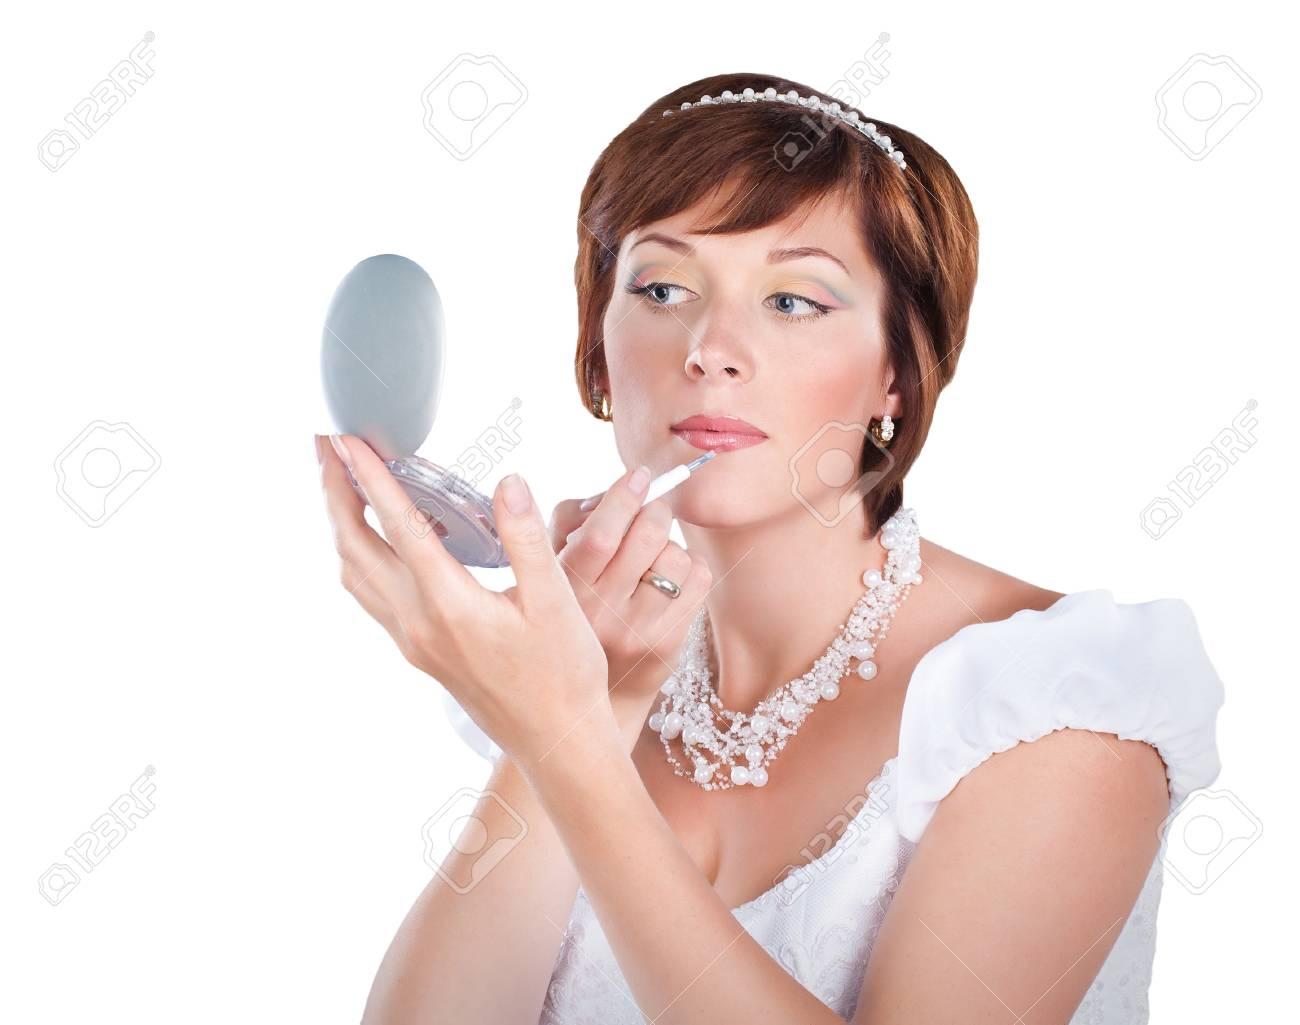 Joven Novia Está Haciendo Maquillaje Aisladas Sobre Fondo Blanco ...